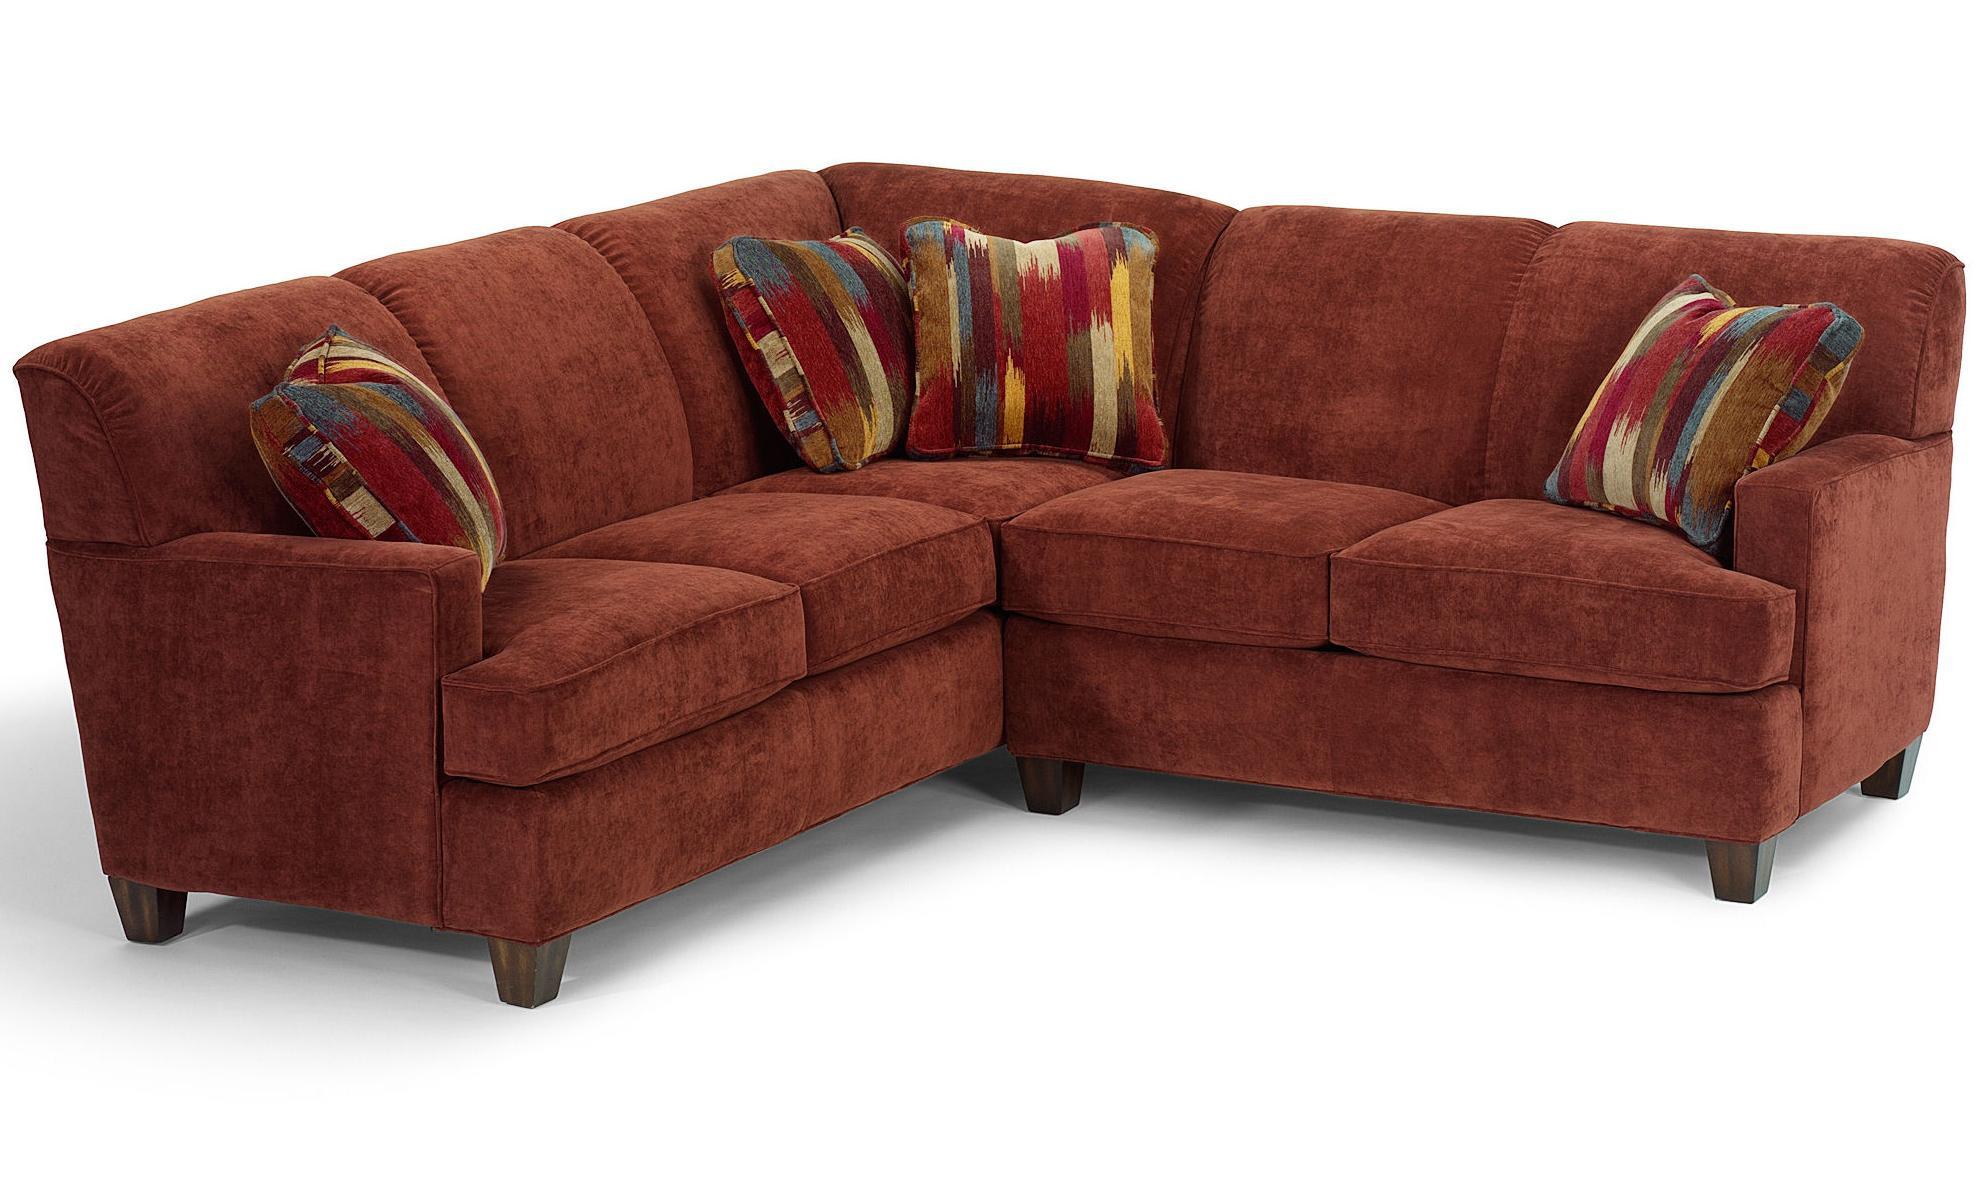 Flexsteel dempsey contemporary 2 piece sectional sofa with for 2 piece sectional sofa with recliner